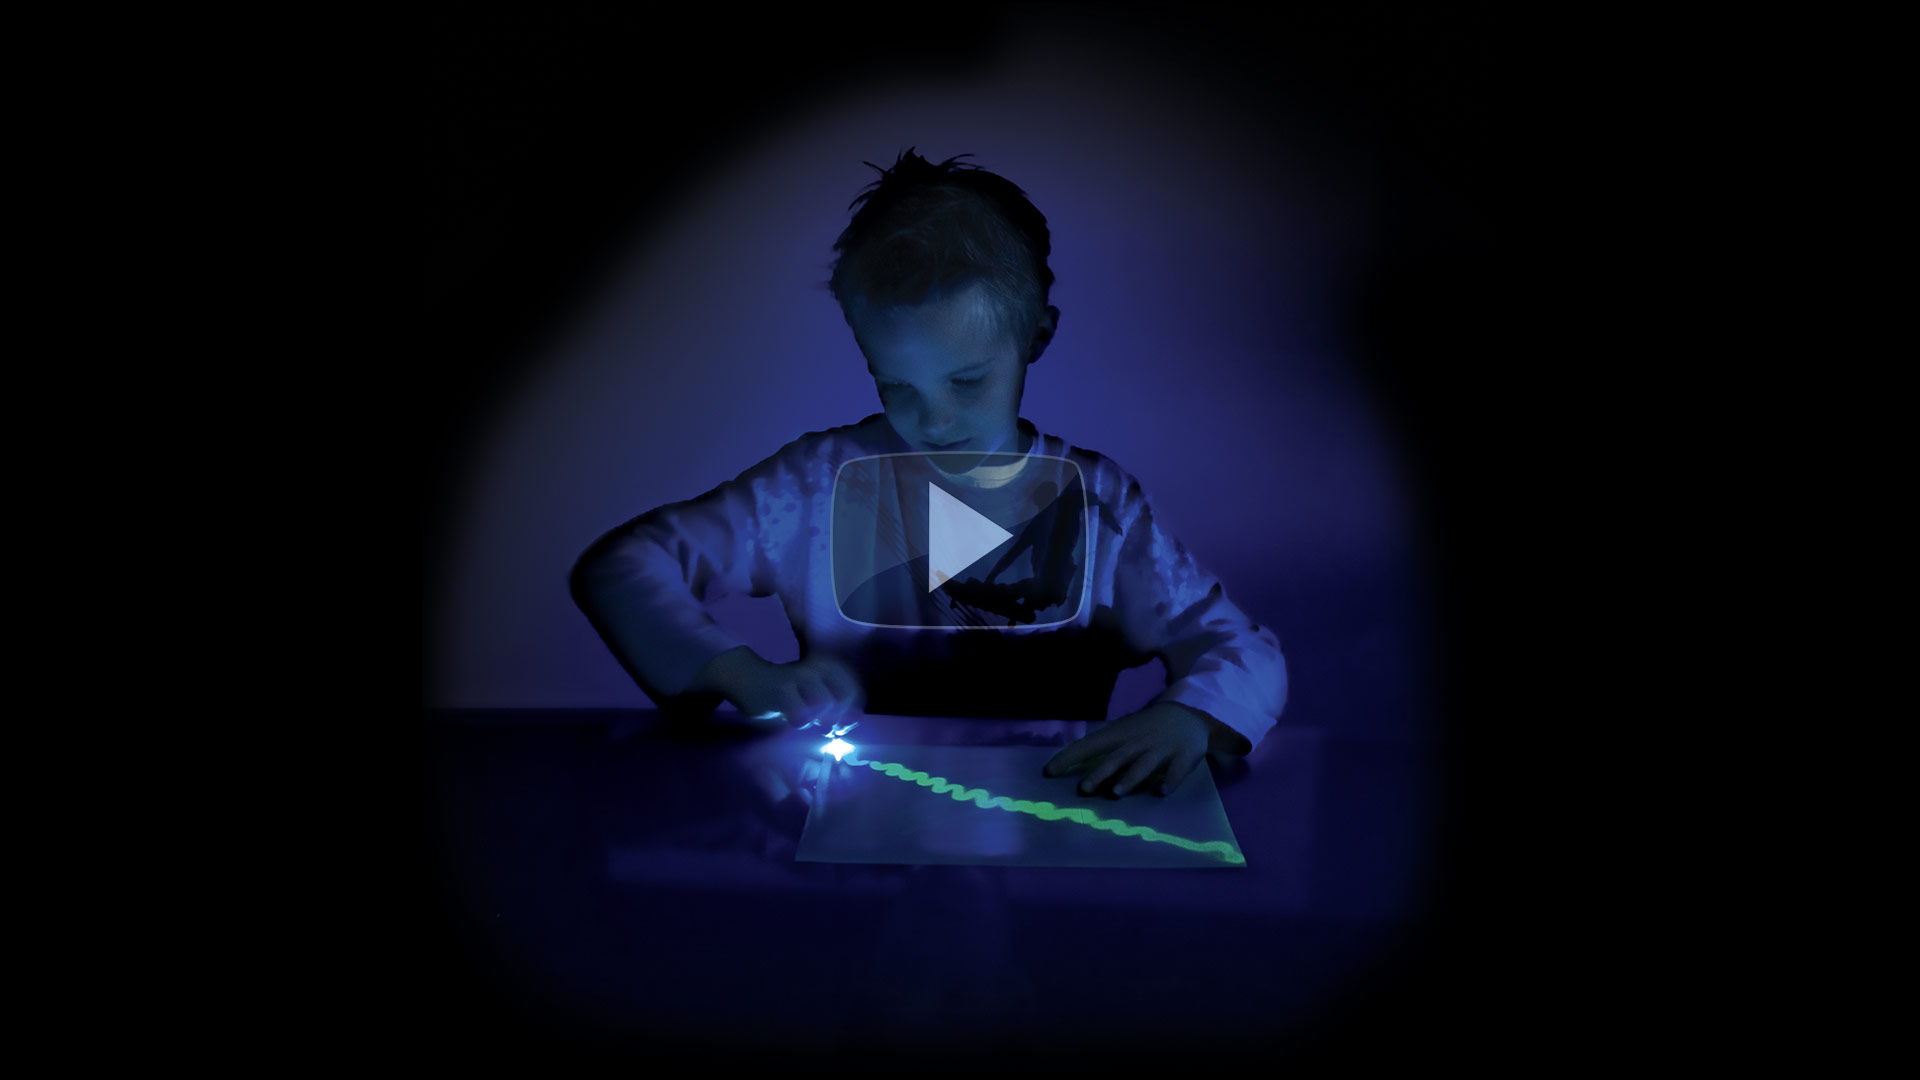 Glow in the Dark Paper - 15 pack